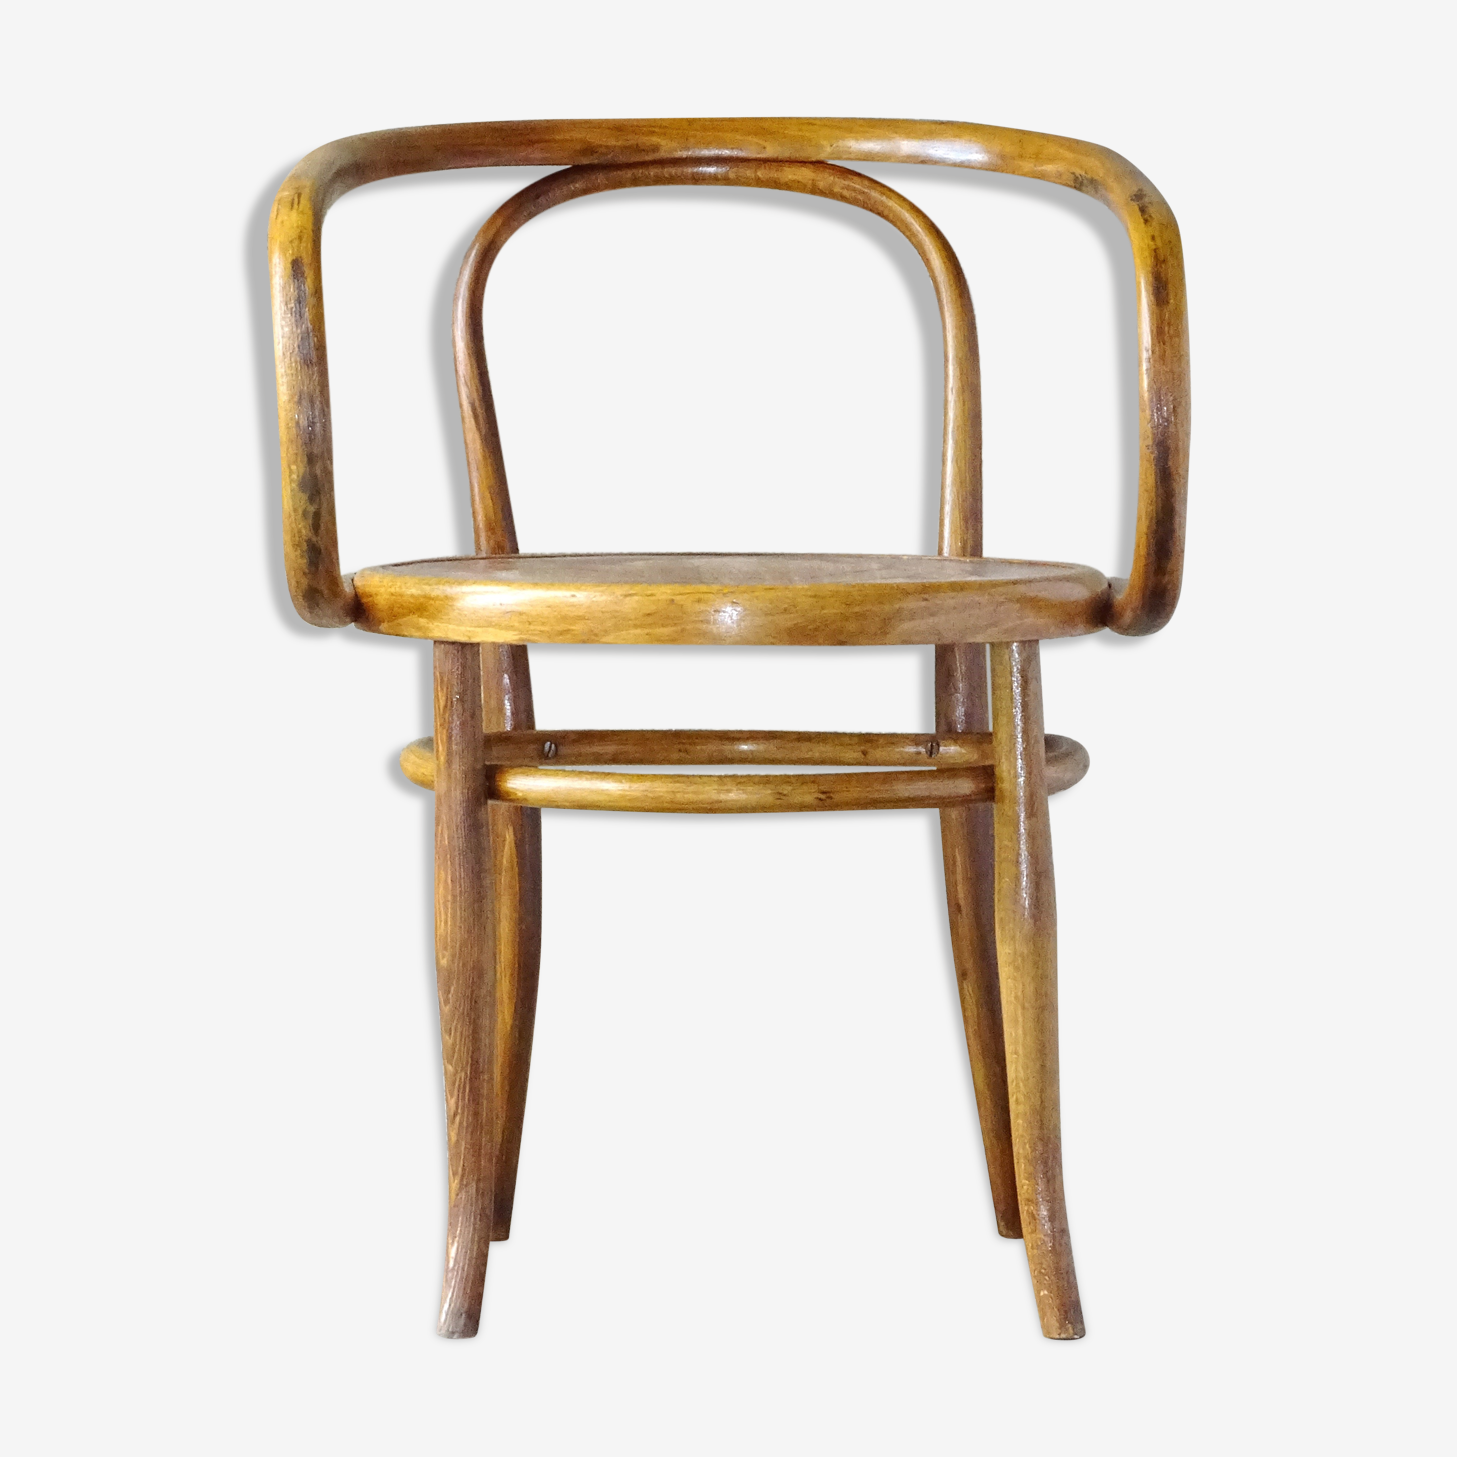 Le Corbusier armchair by Ungvar 1905